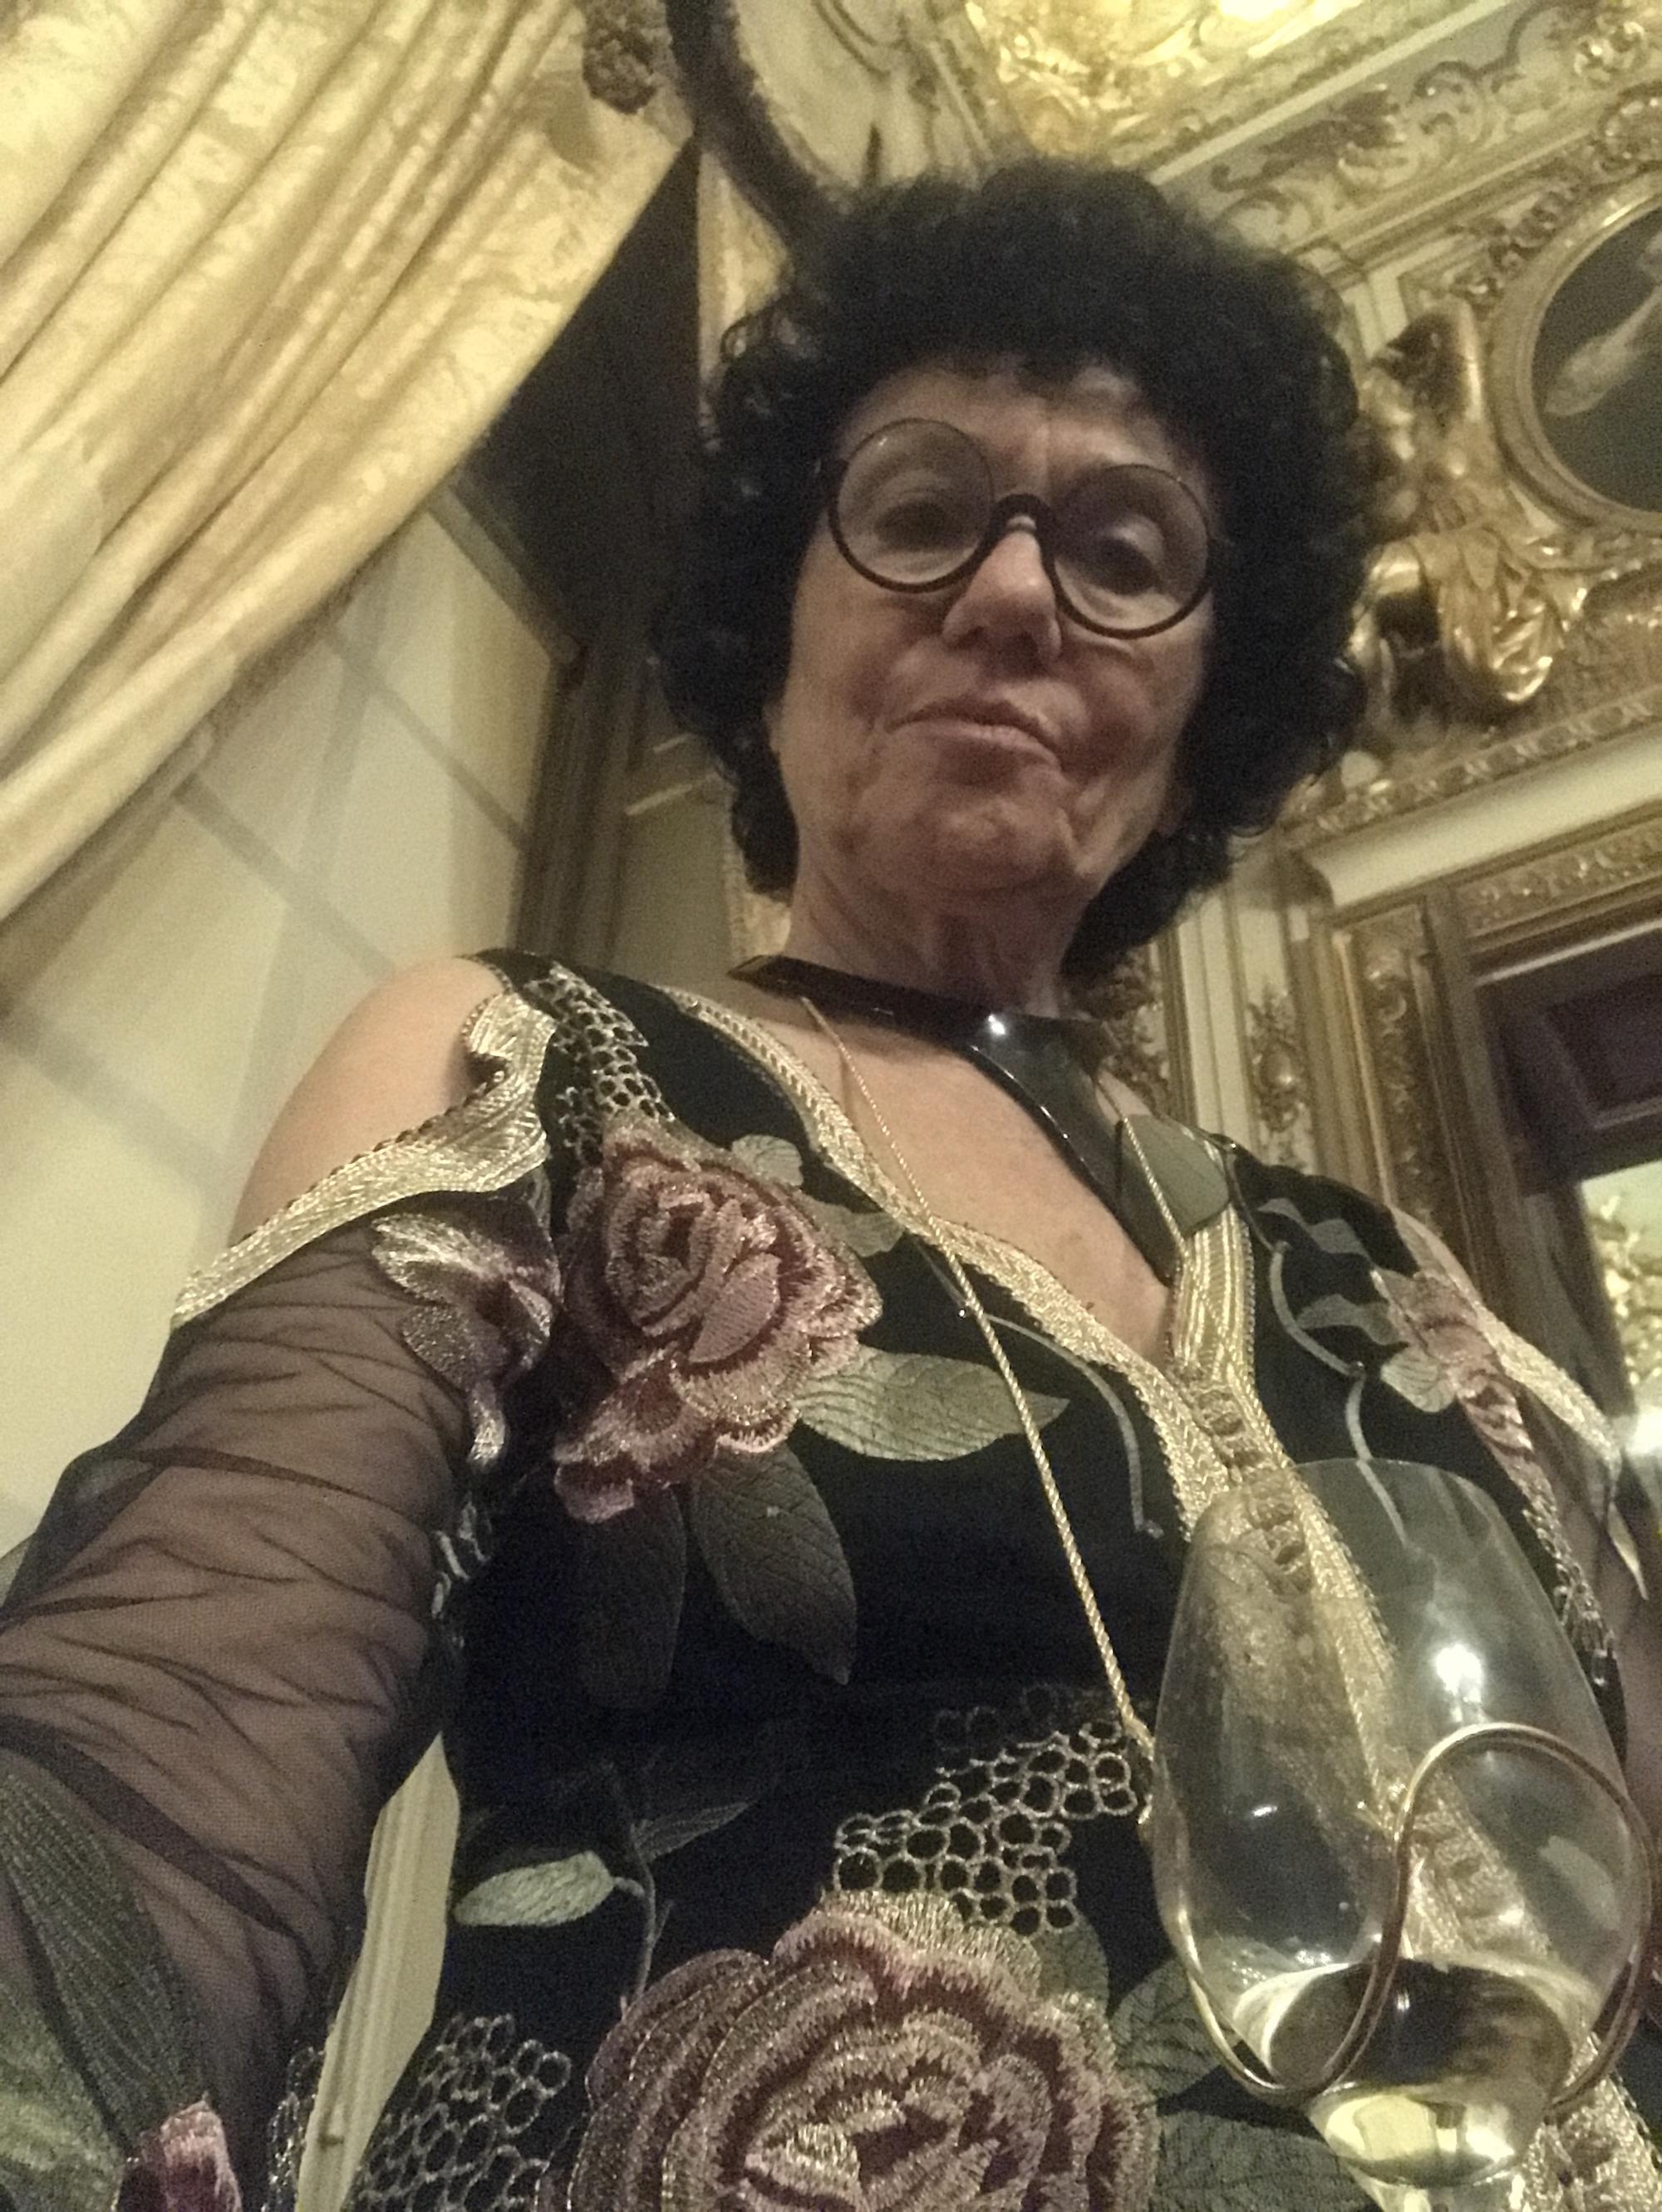 People | Family, Patrizia Brusarosco, 2019